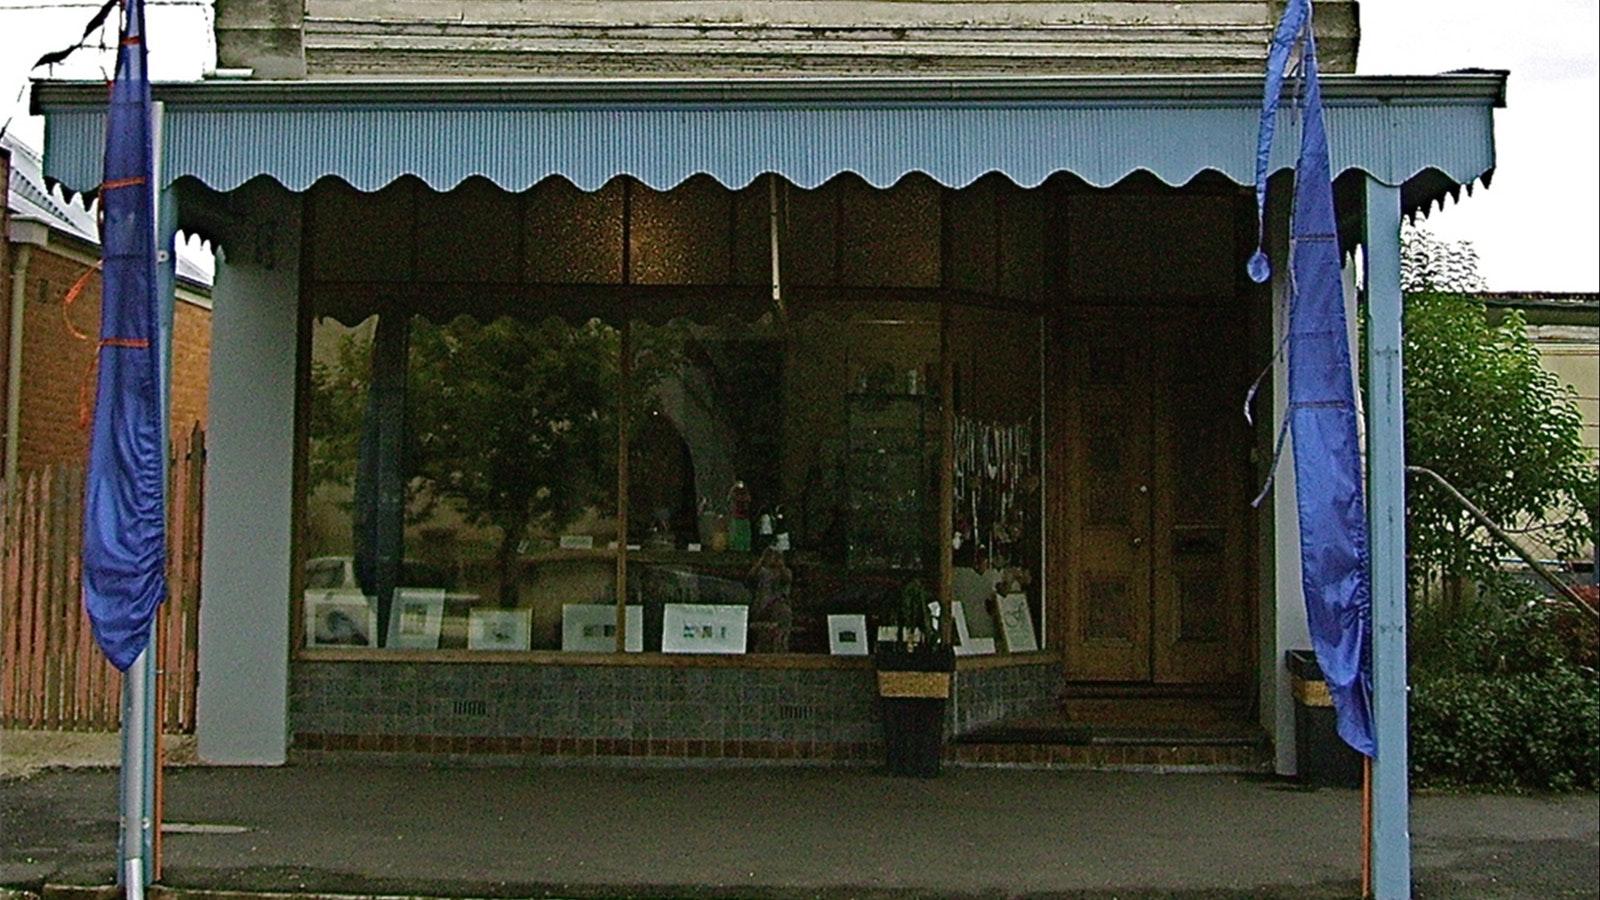 Falkner Gallery street view